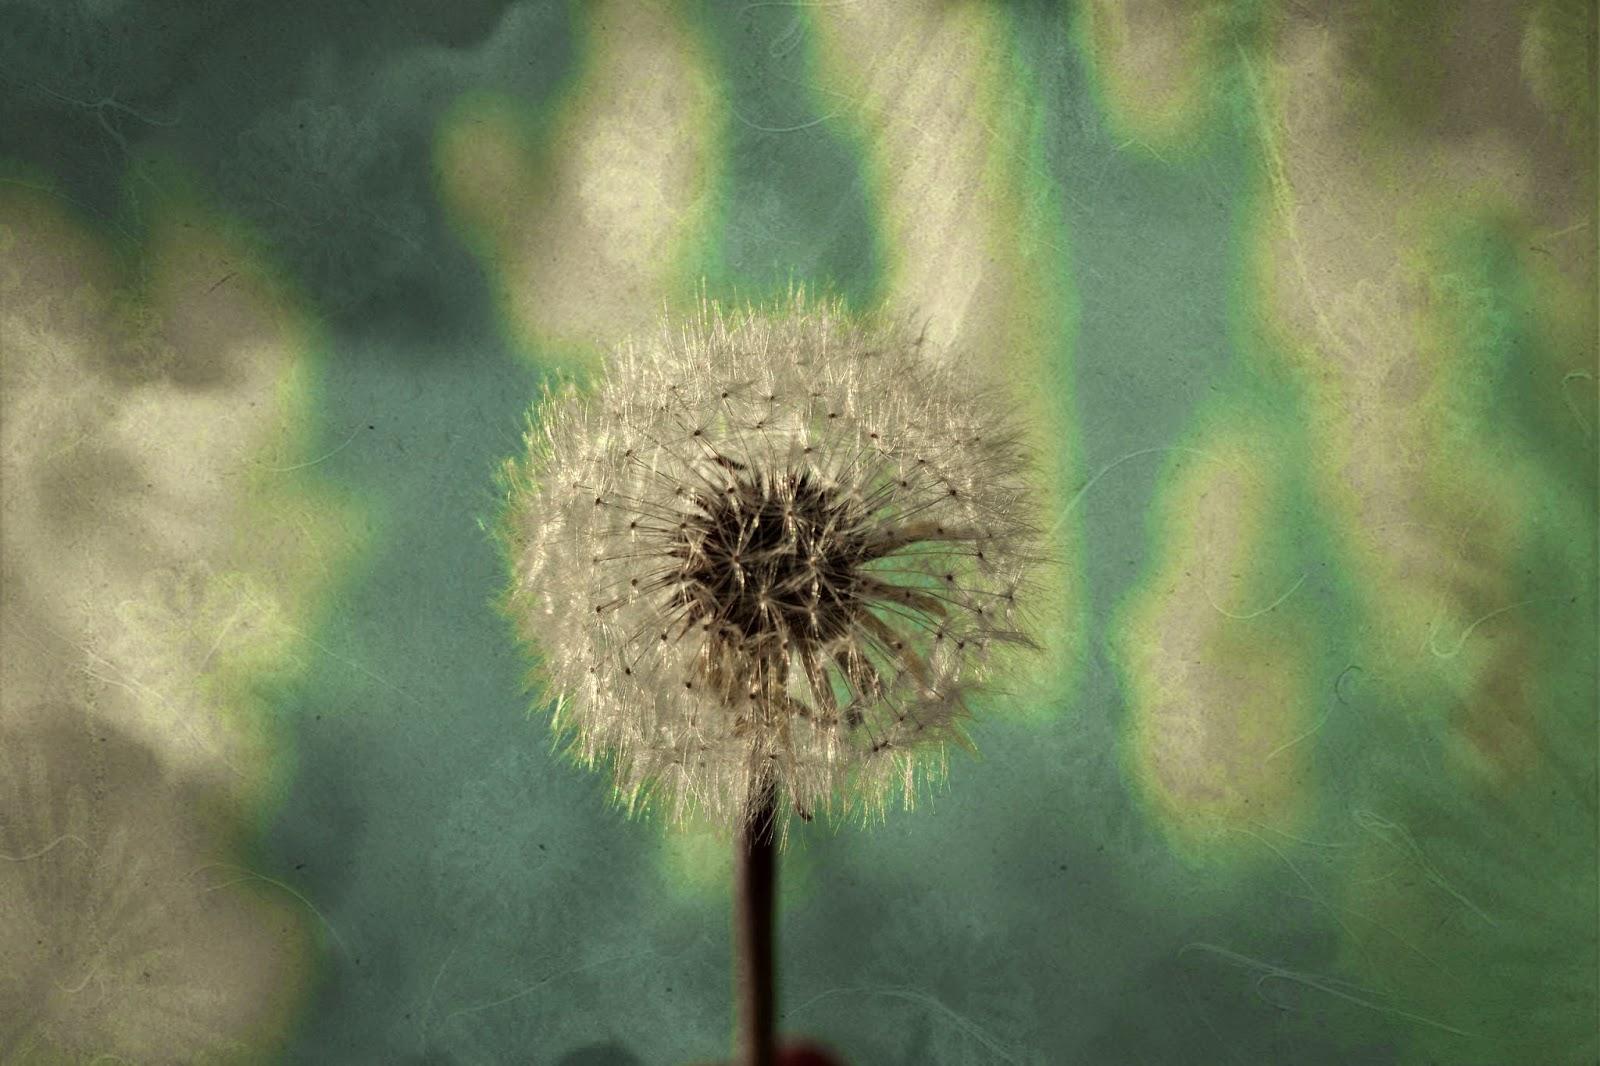 Dandelion Art photography